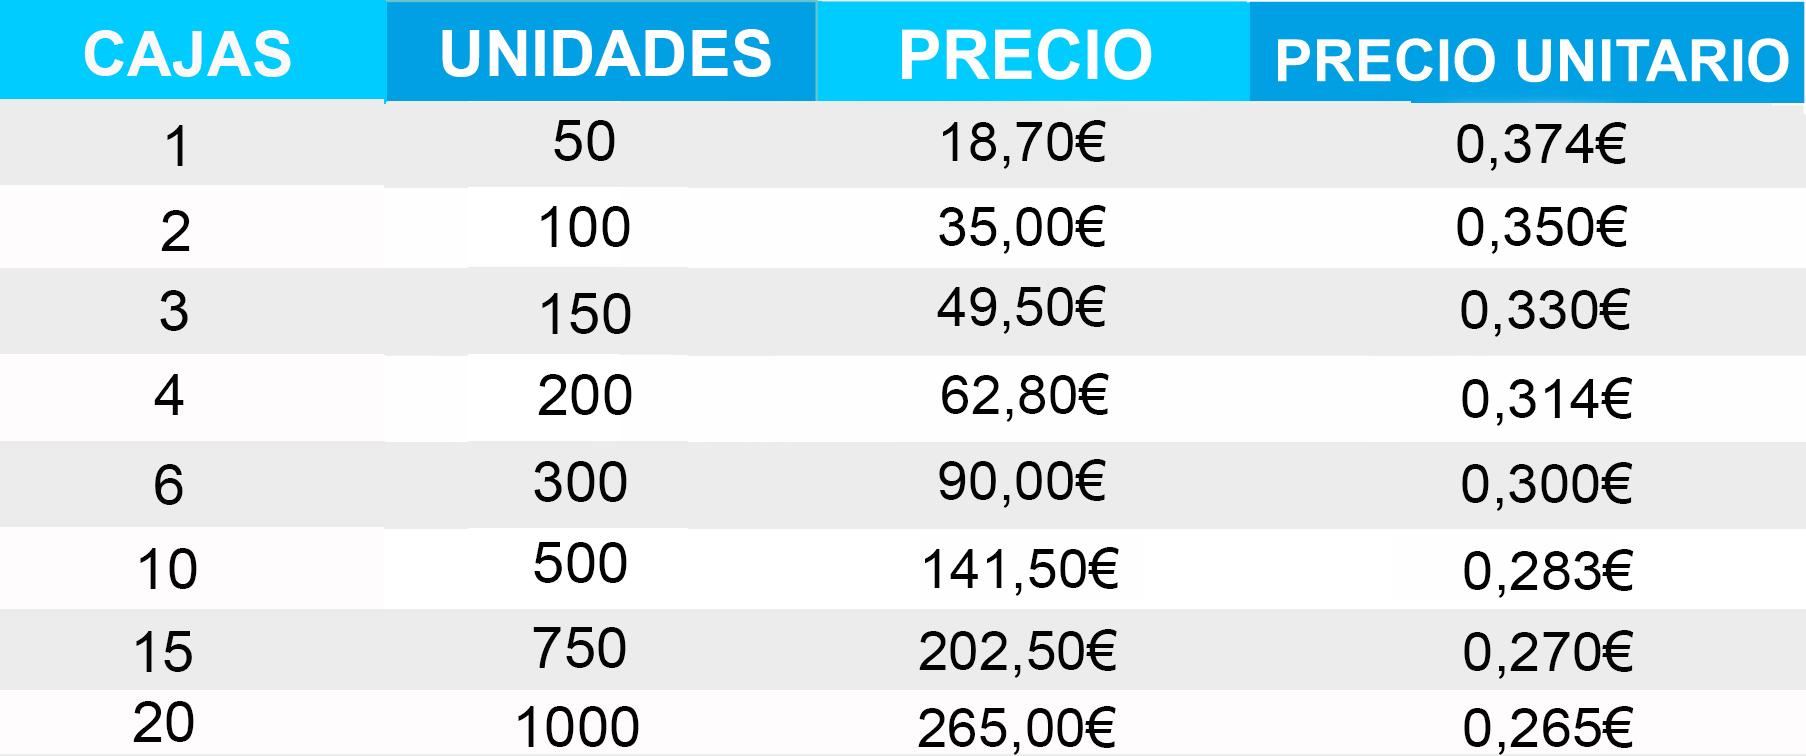 TABLA PATO 30-03.jpg